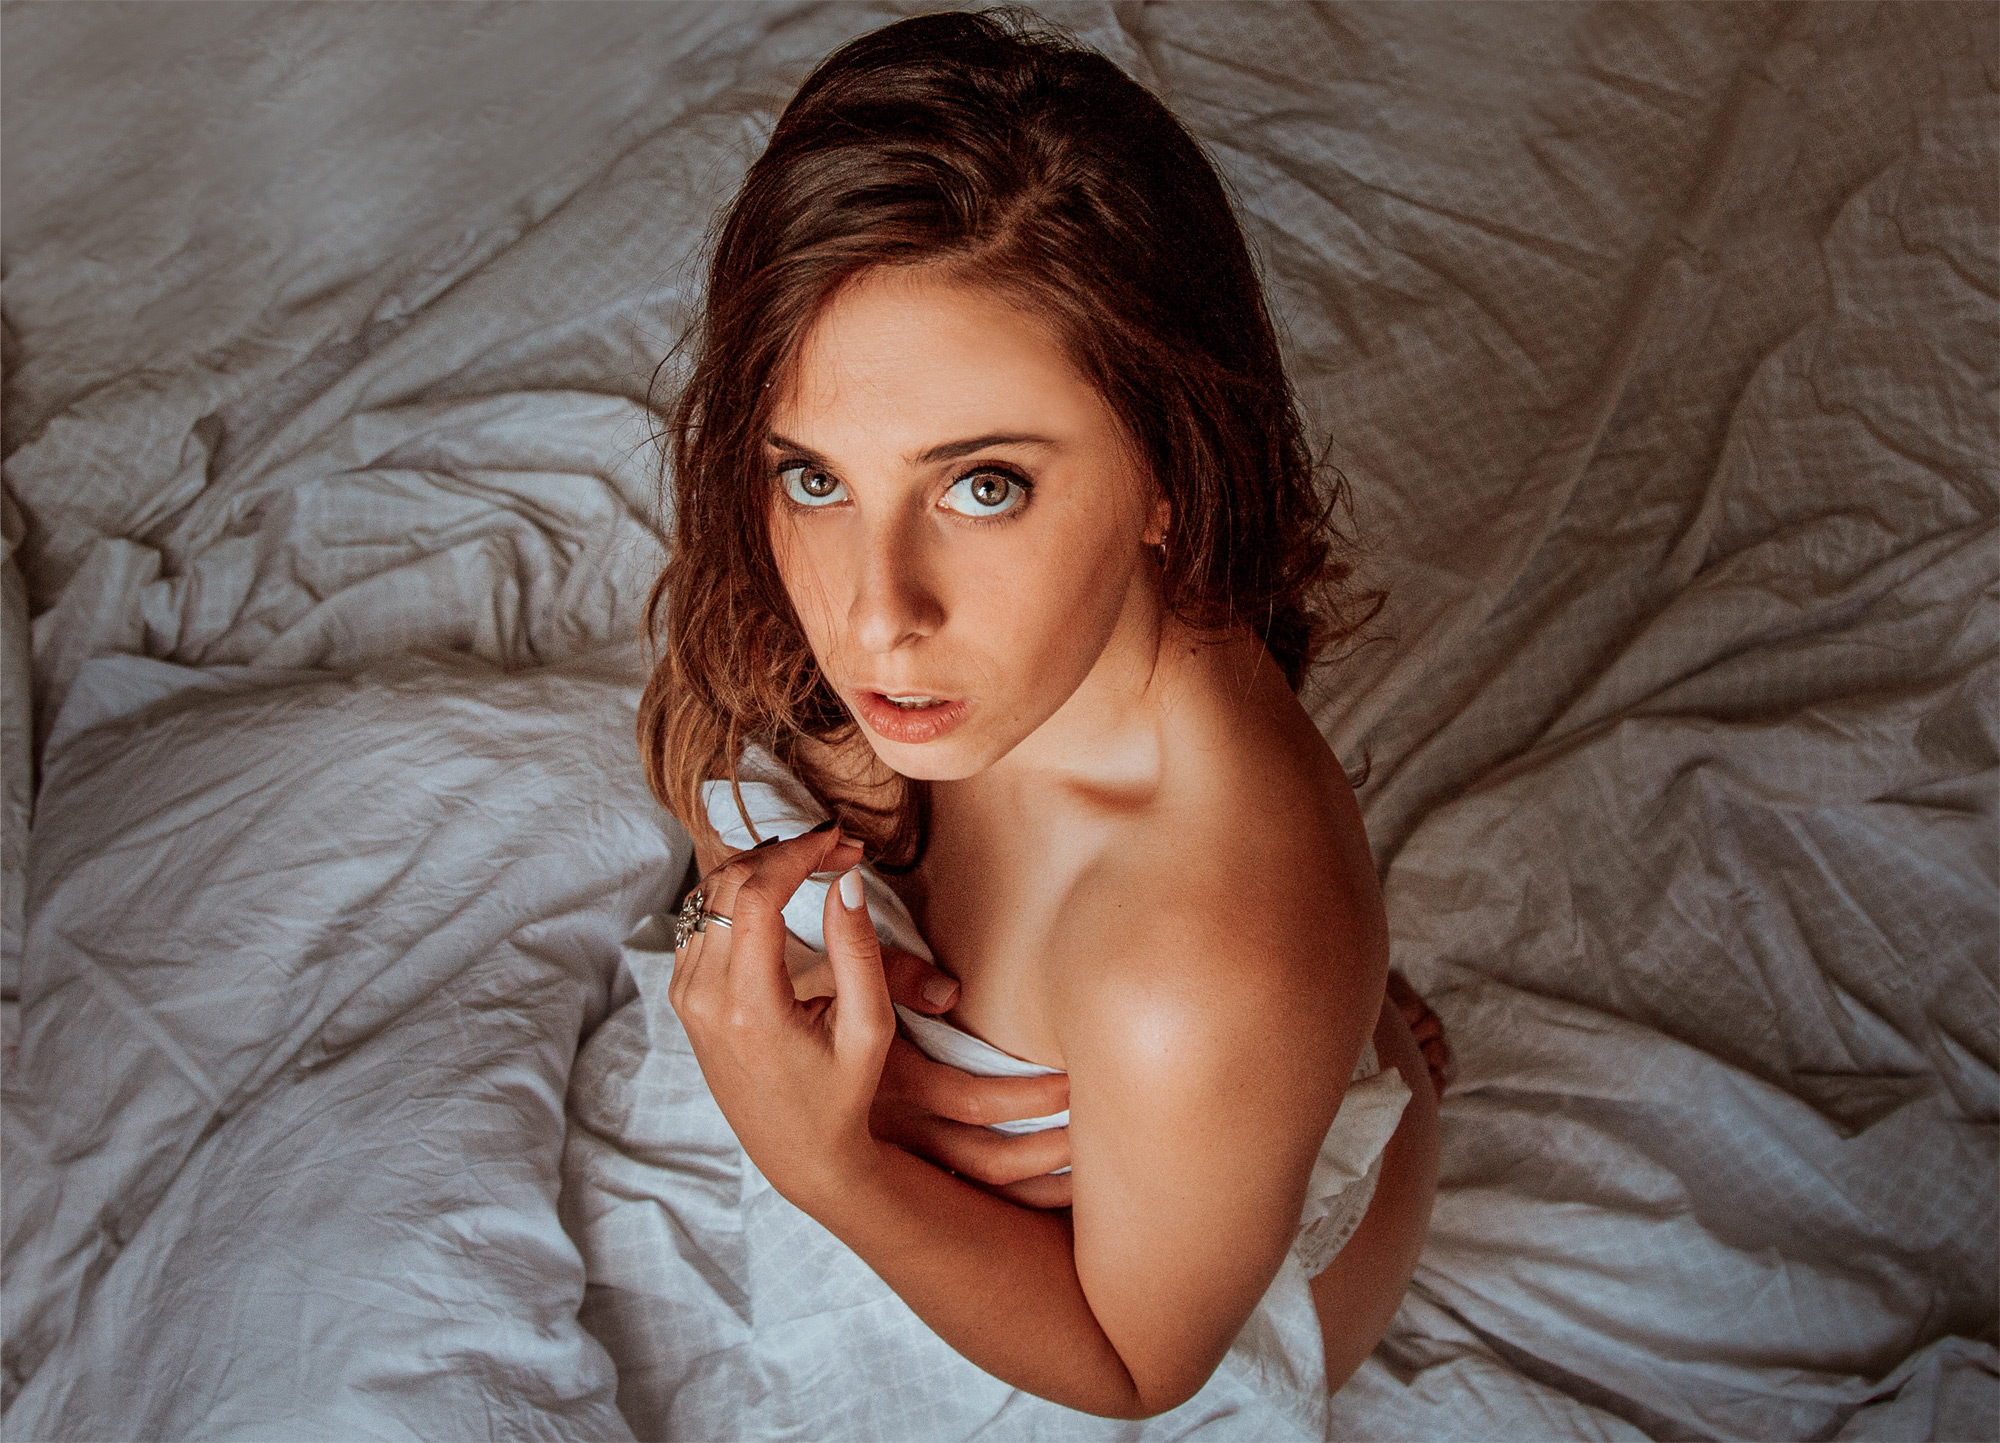 DATE 18 ⚥ Sexkontakte